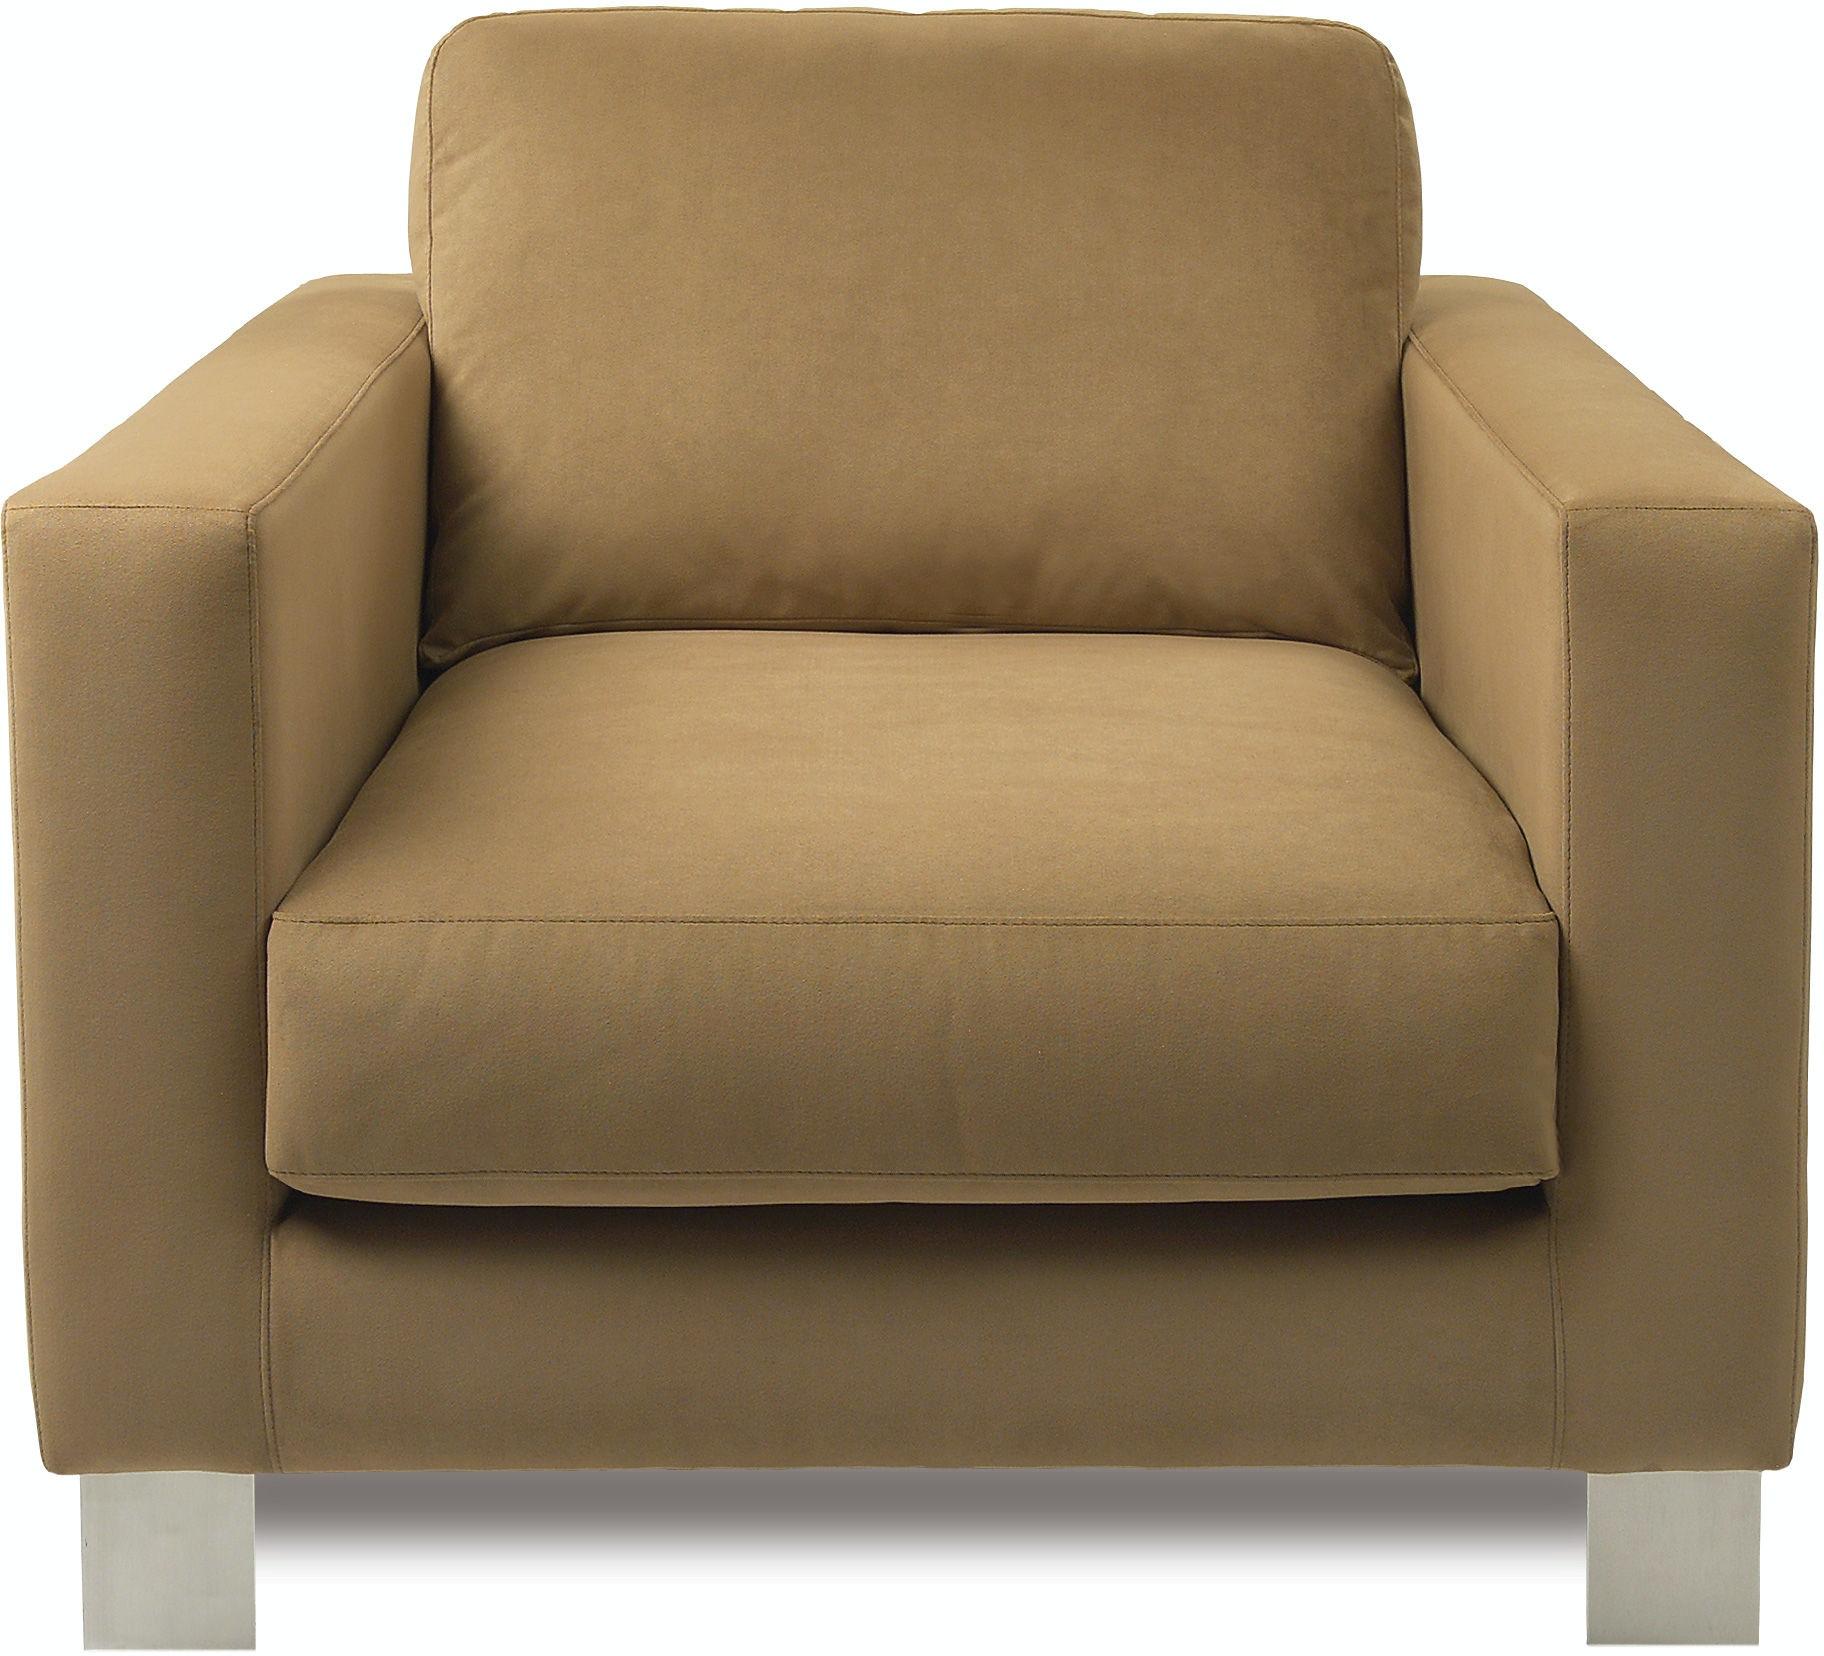 Living Room Chairs Georgian Furnishing And Bergerhome New - artisan home decor mandeville